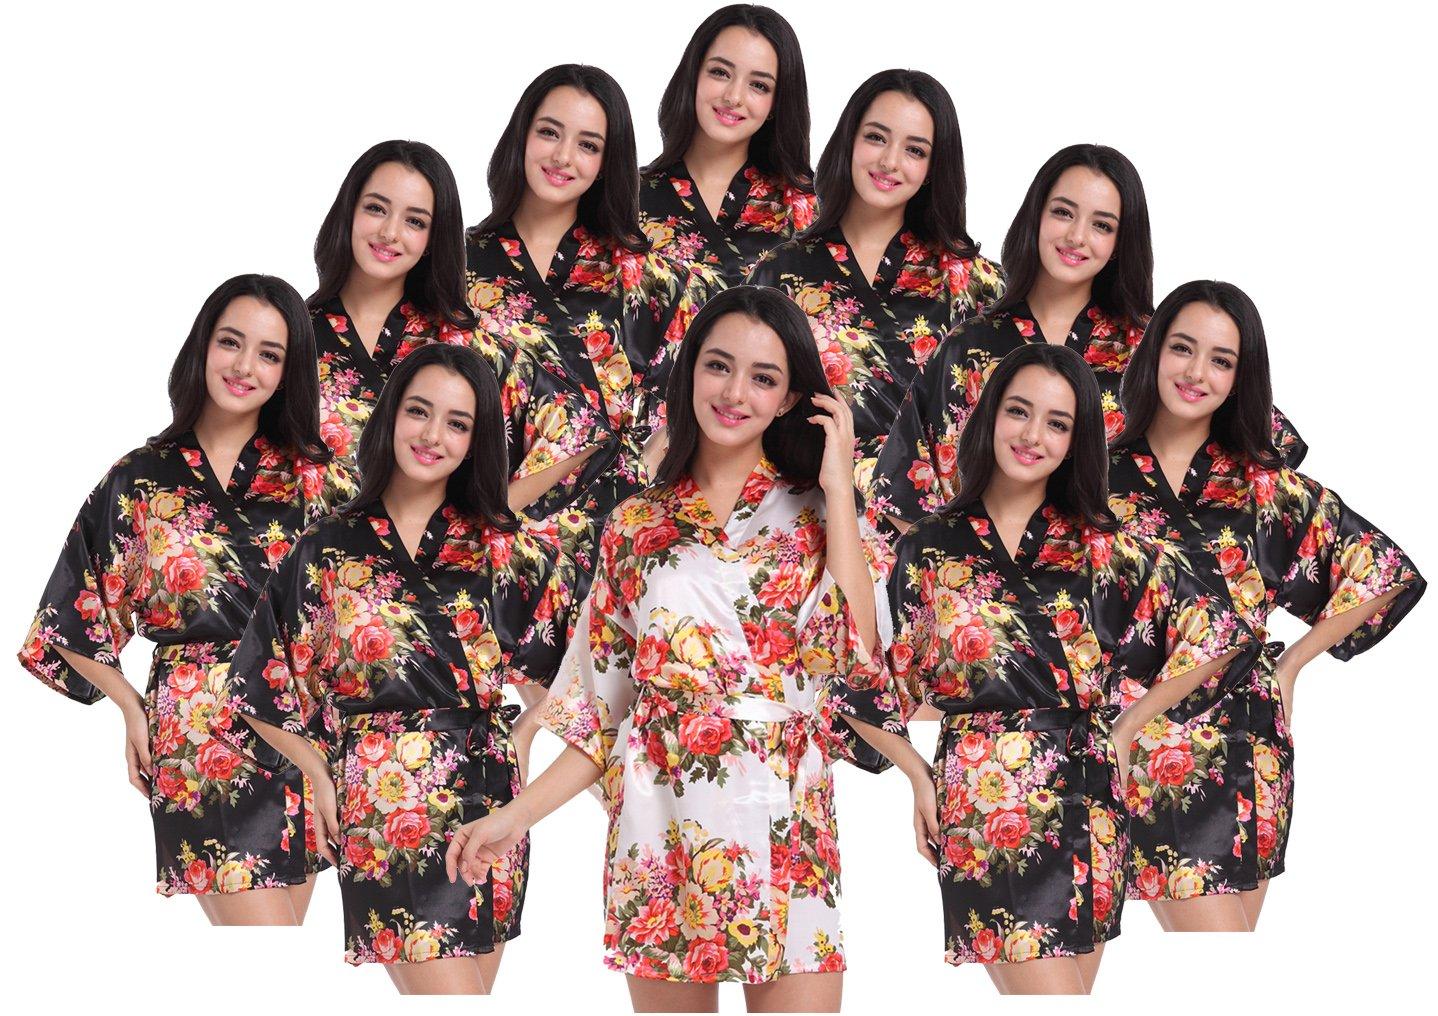 Women's Kimono Floral Robes for Bride and Bridesmaid Wedding Party Satin Robes Short